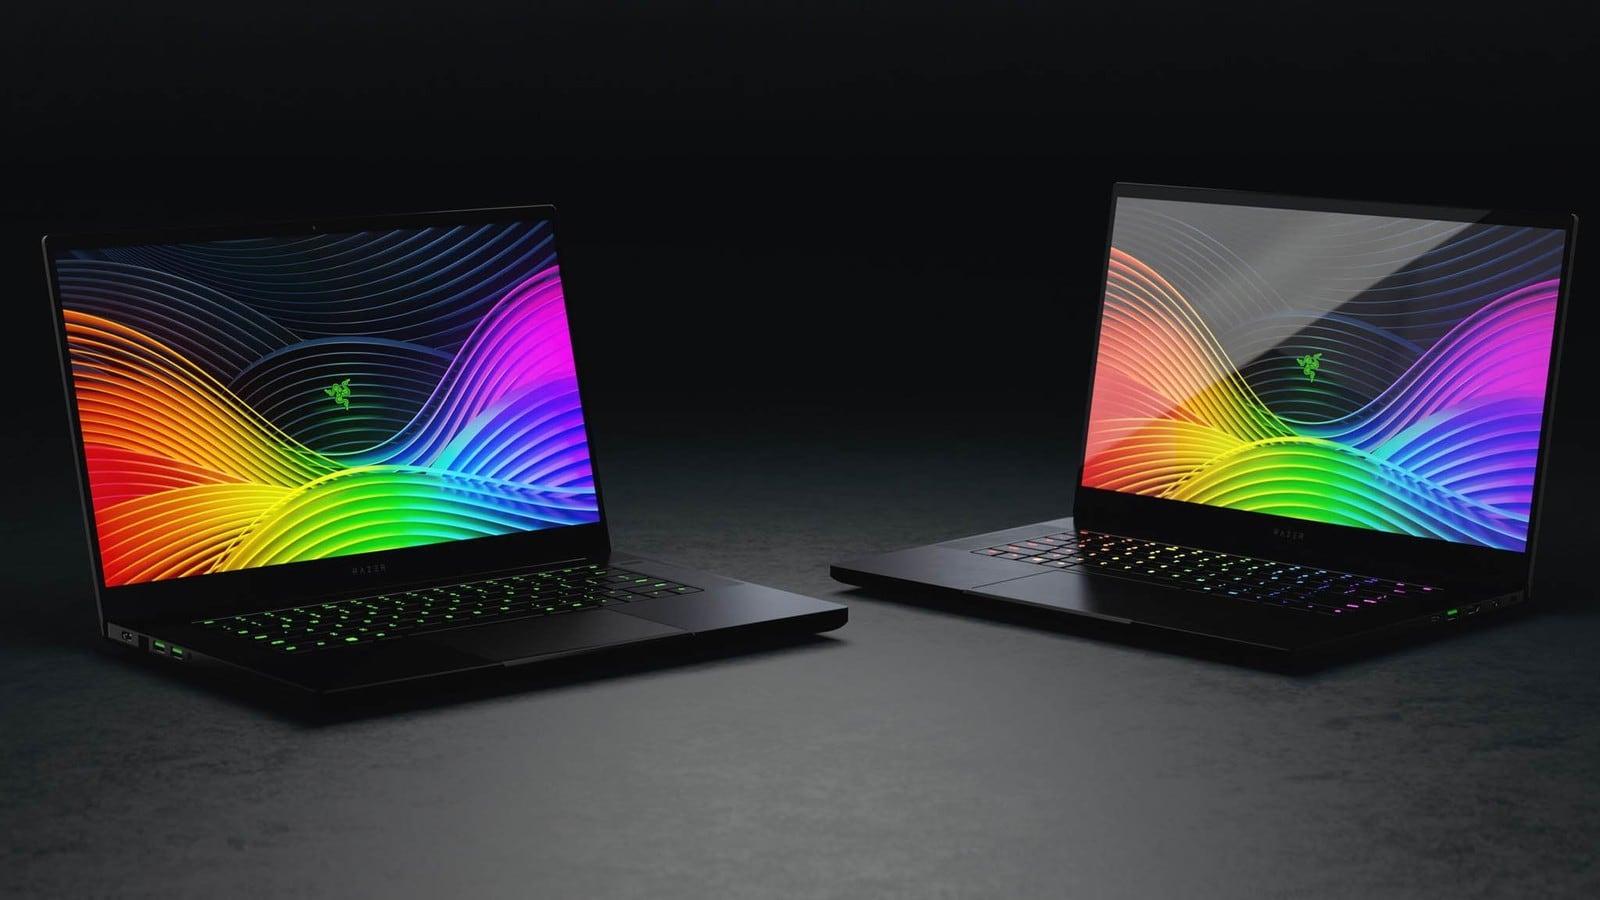 Razer Blade 15 Studio Edition 8-Core Laptop achieves all your creative needs